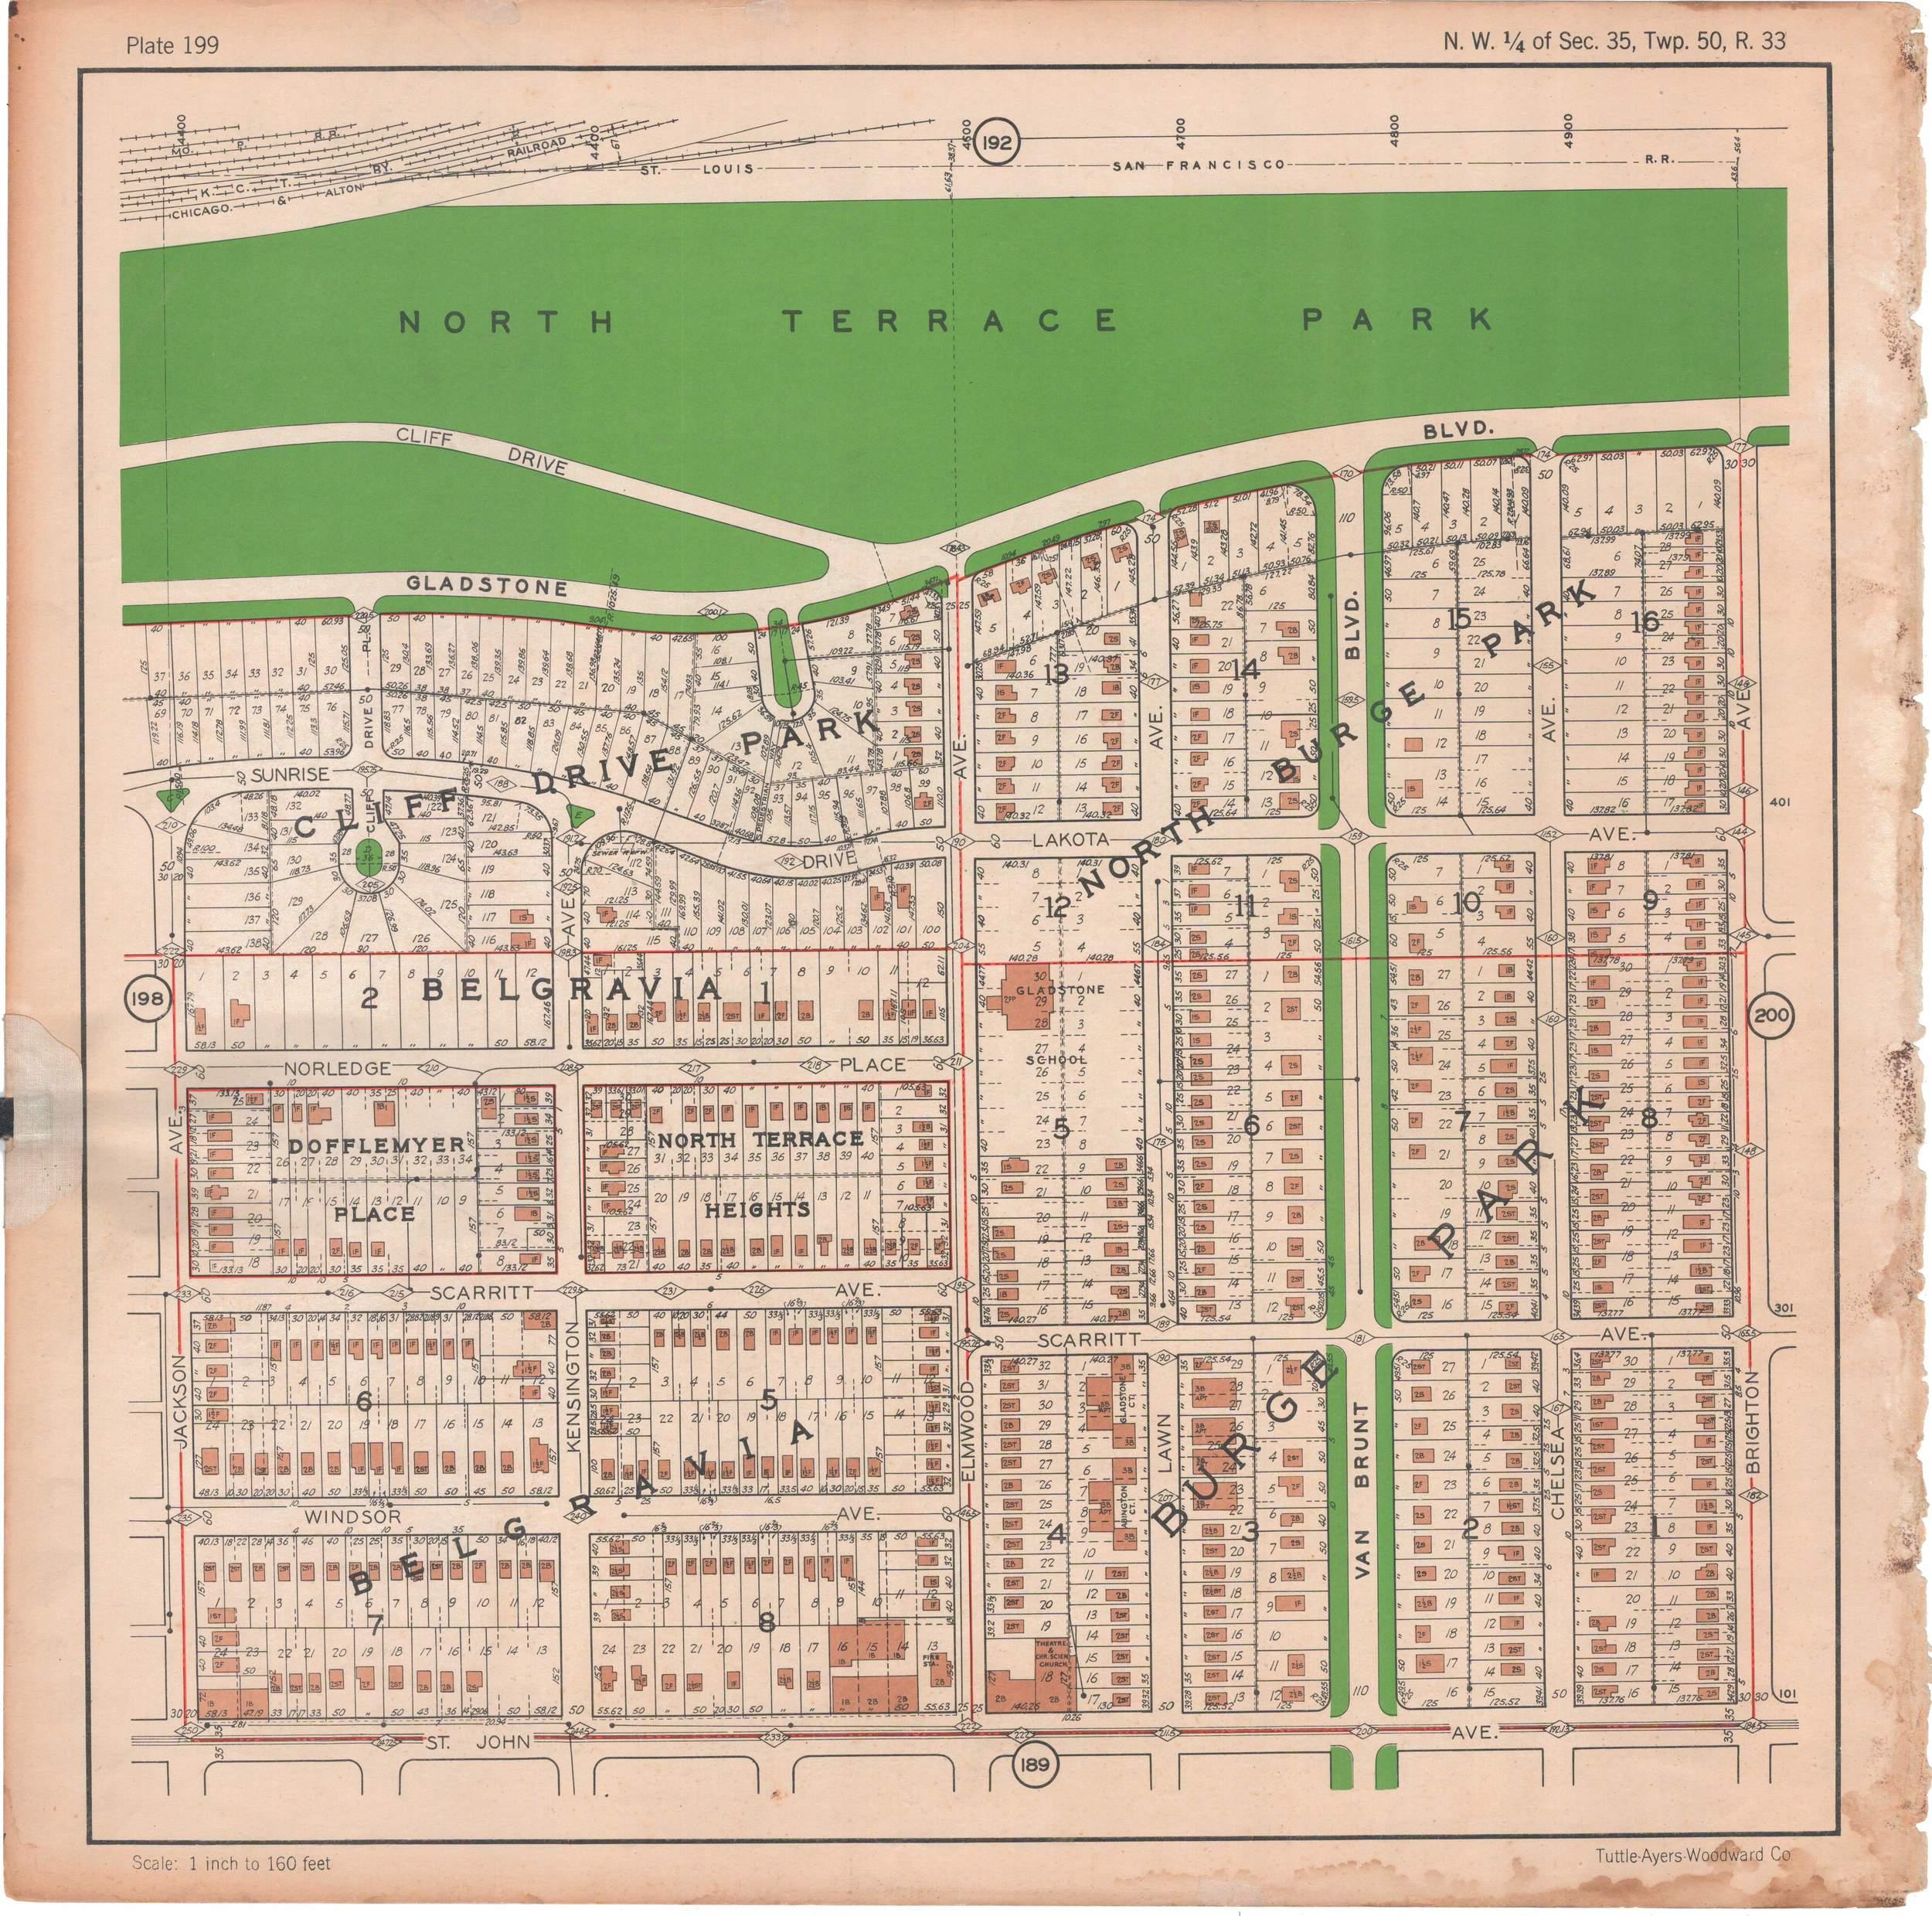 1925 TUTTLE_AYERS_Plate_199.JPG